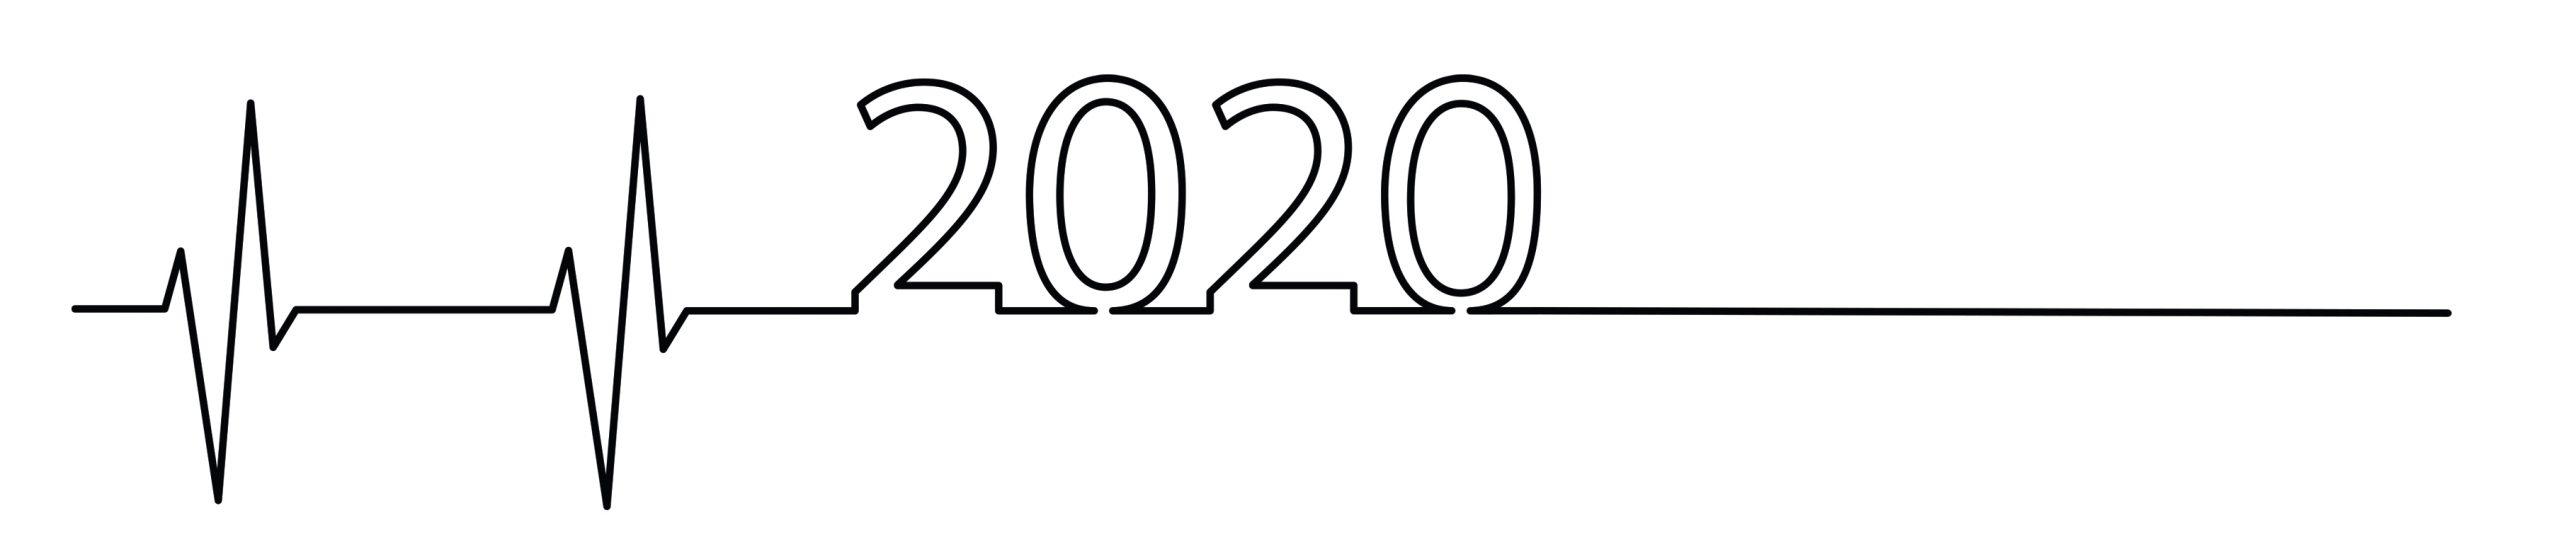 Adéu 2020!